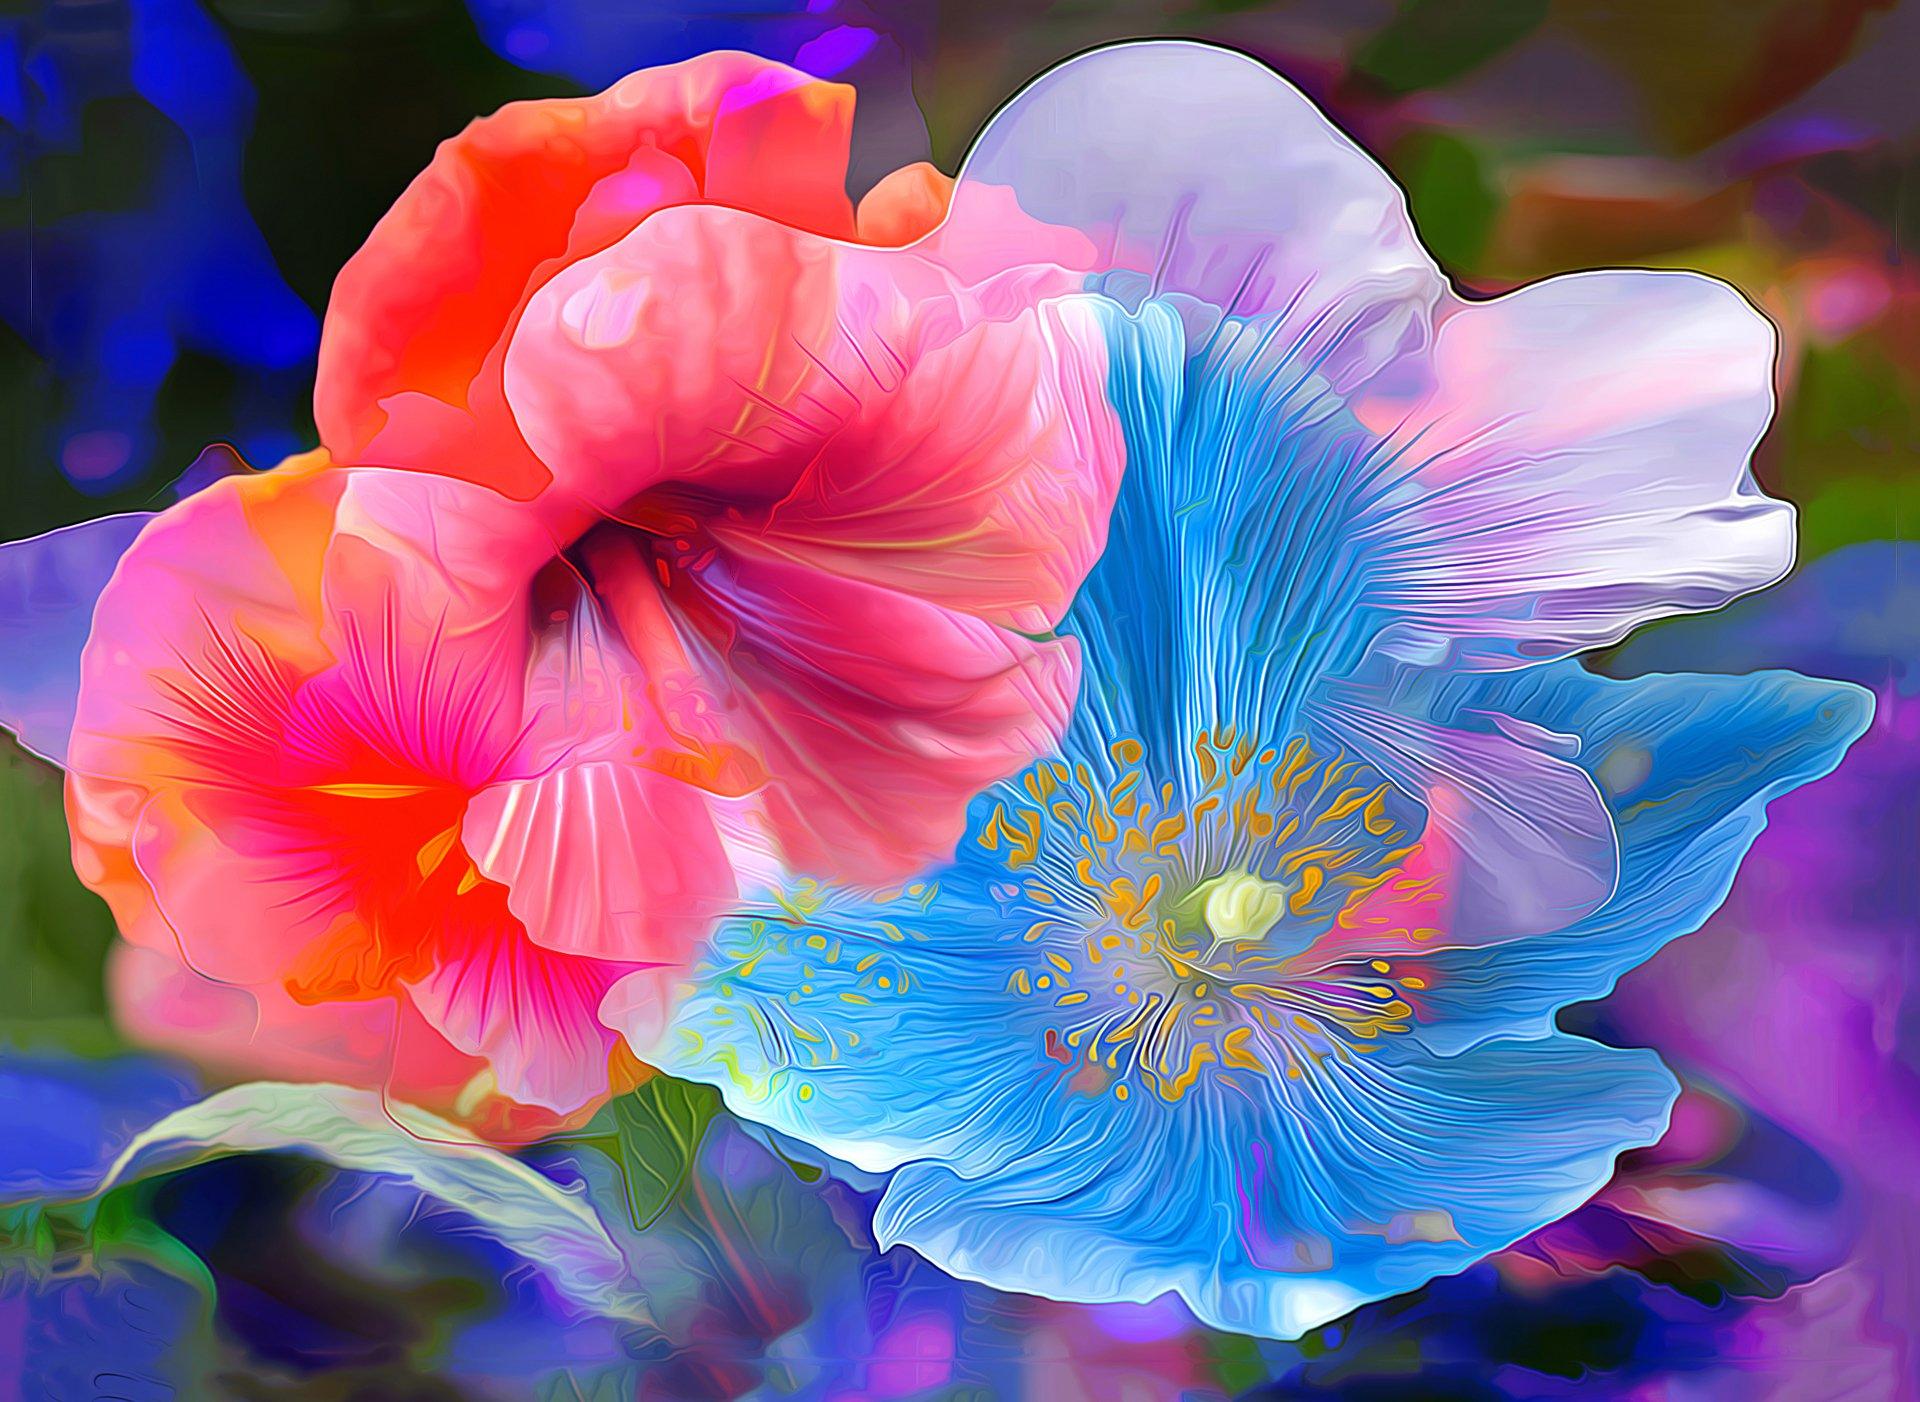 Abstract Flower Painting Hd Wallpaper Hintergrund